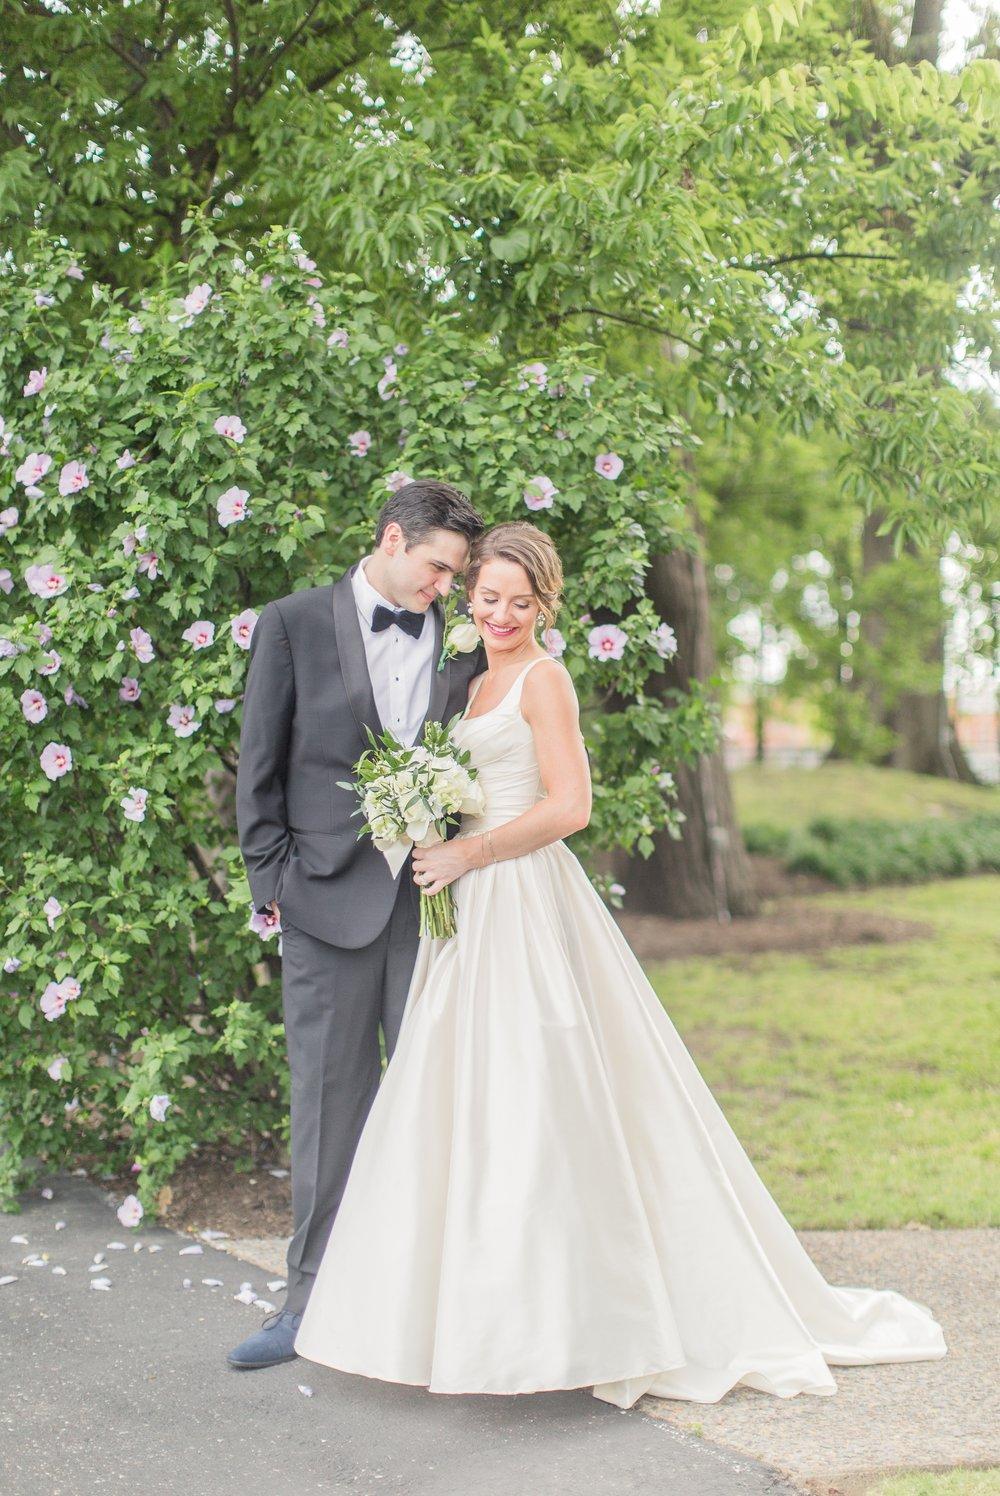 memphis-wedding-hunt-phelan 23.jpg